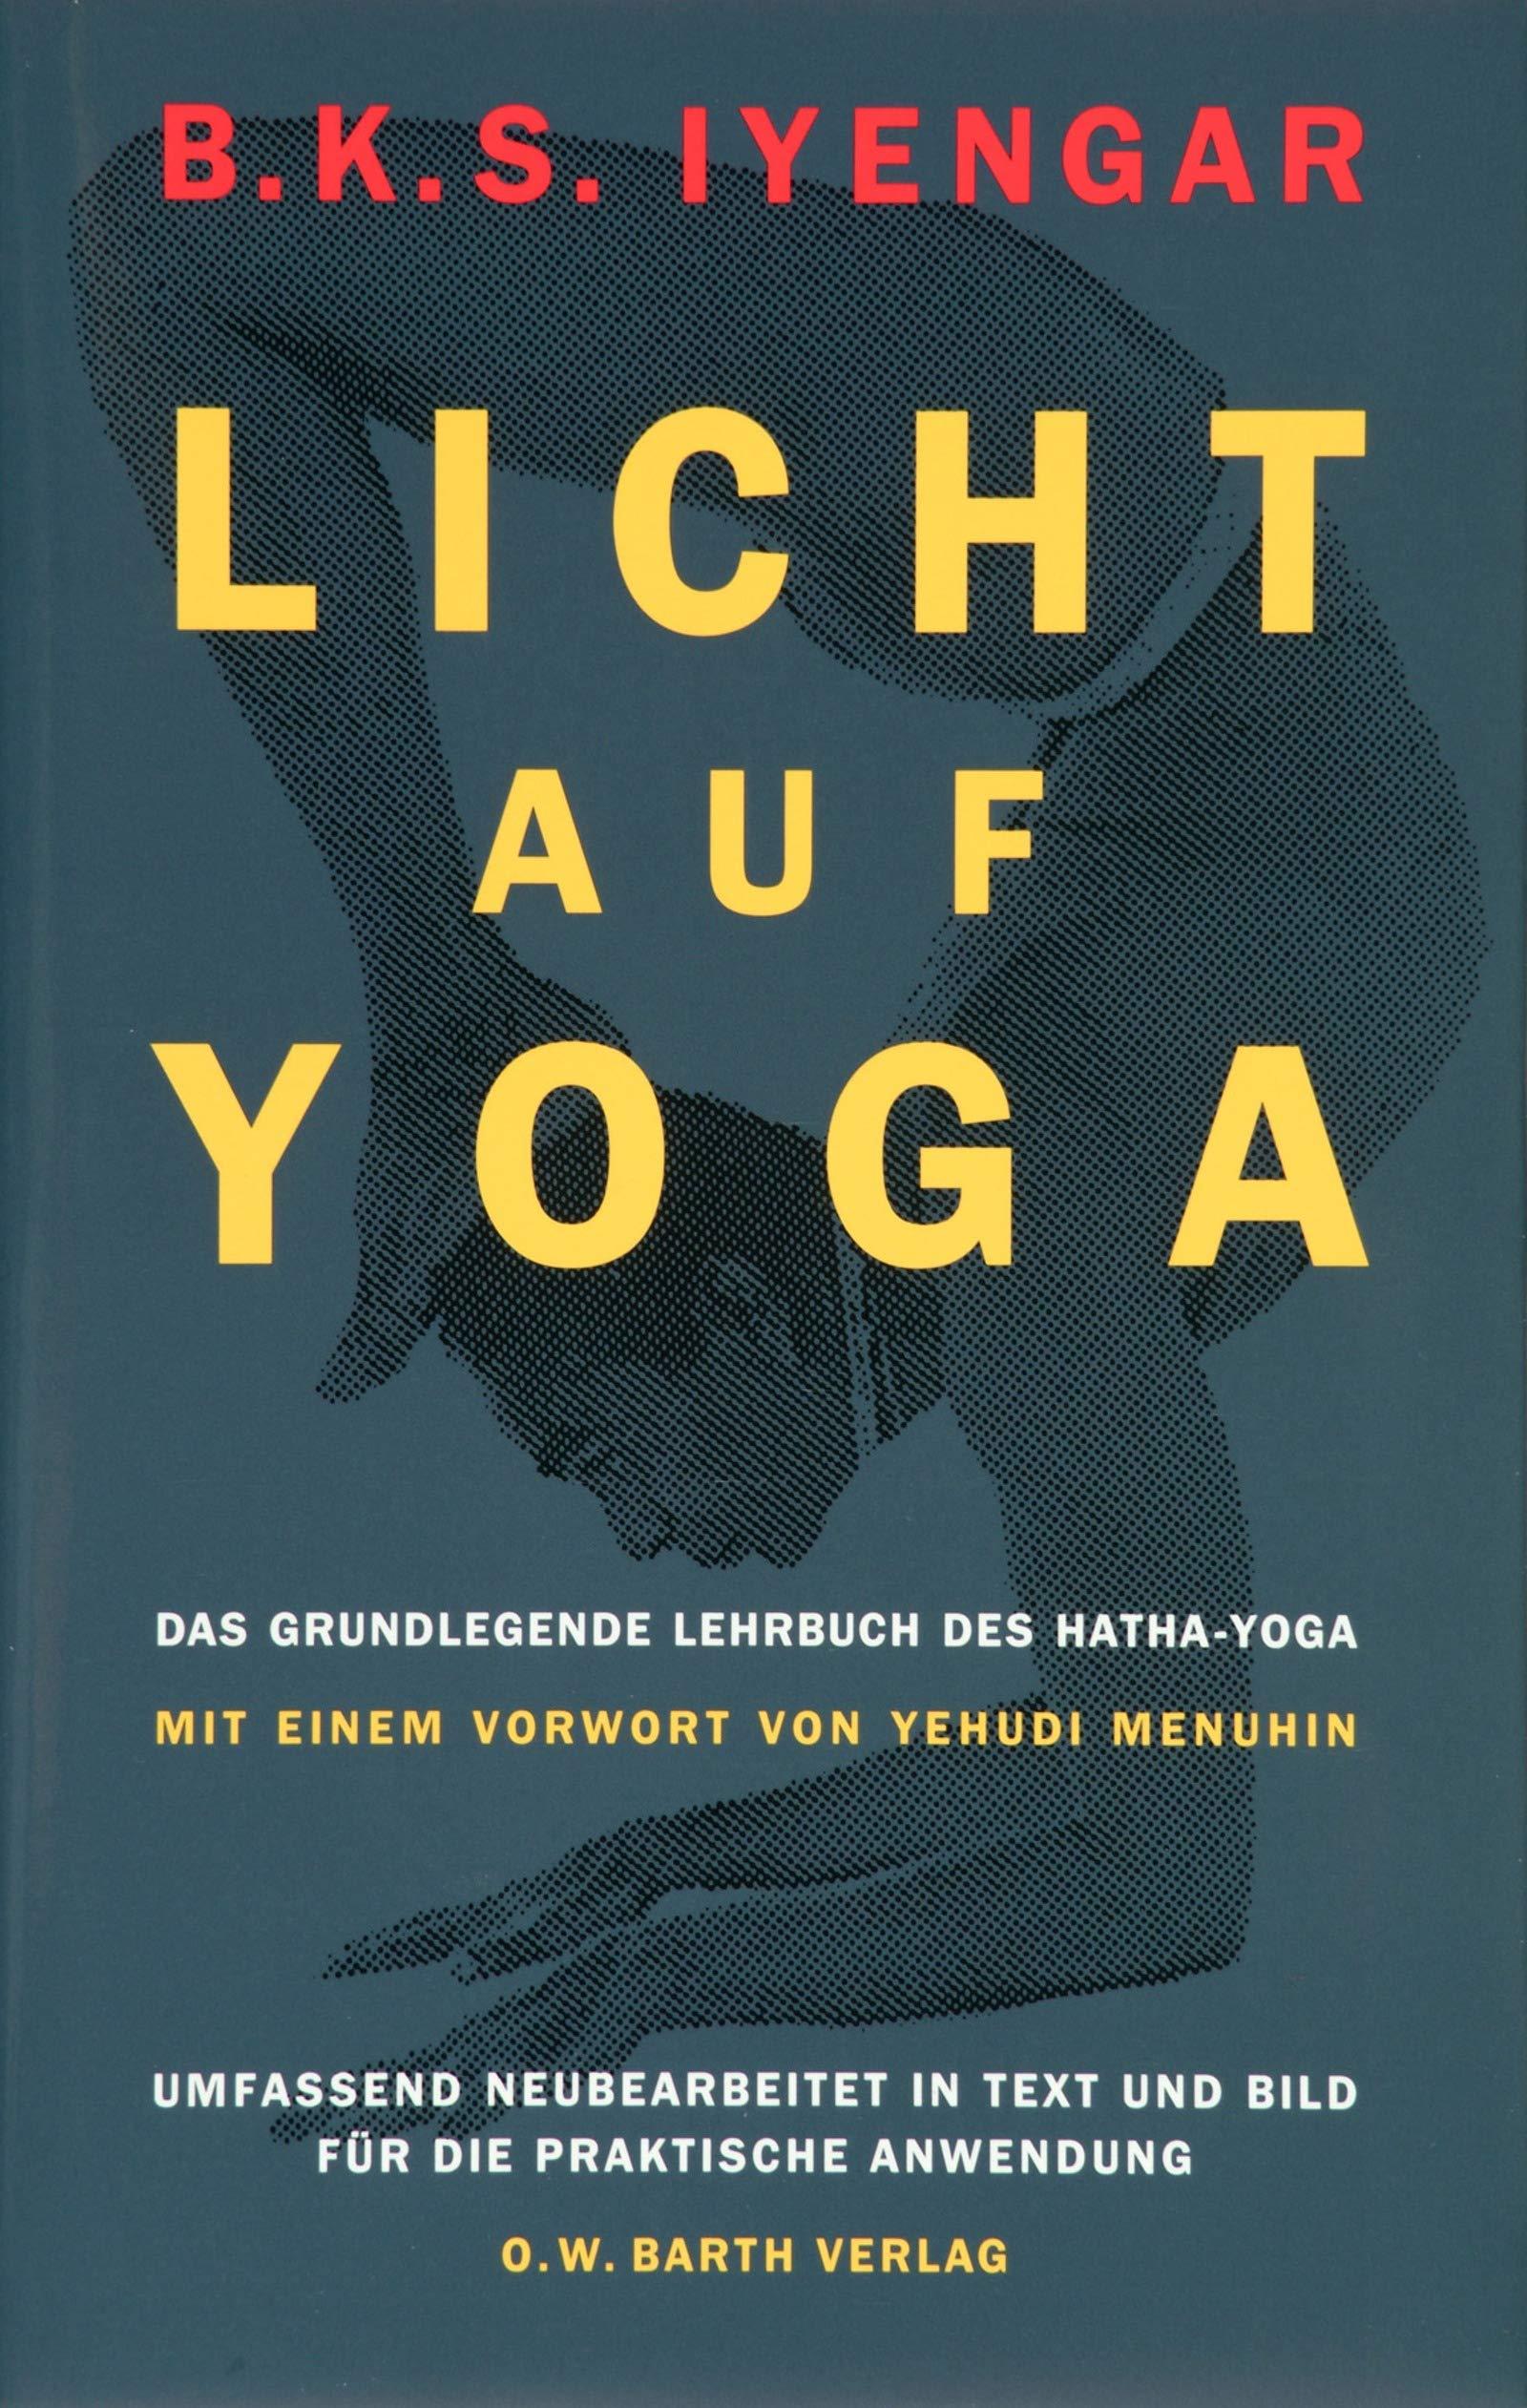 Licht auf Yoga. Yoga Dipika. Das grundlegende Lehrbuch des ...